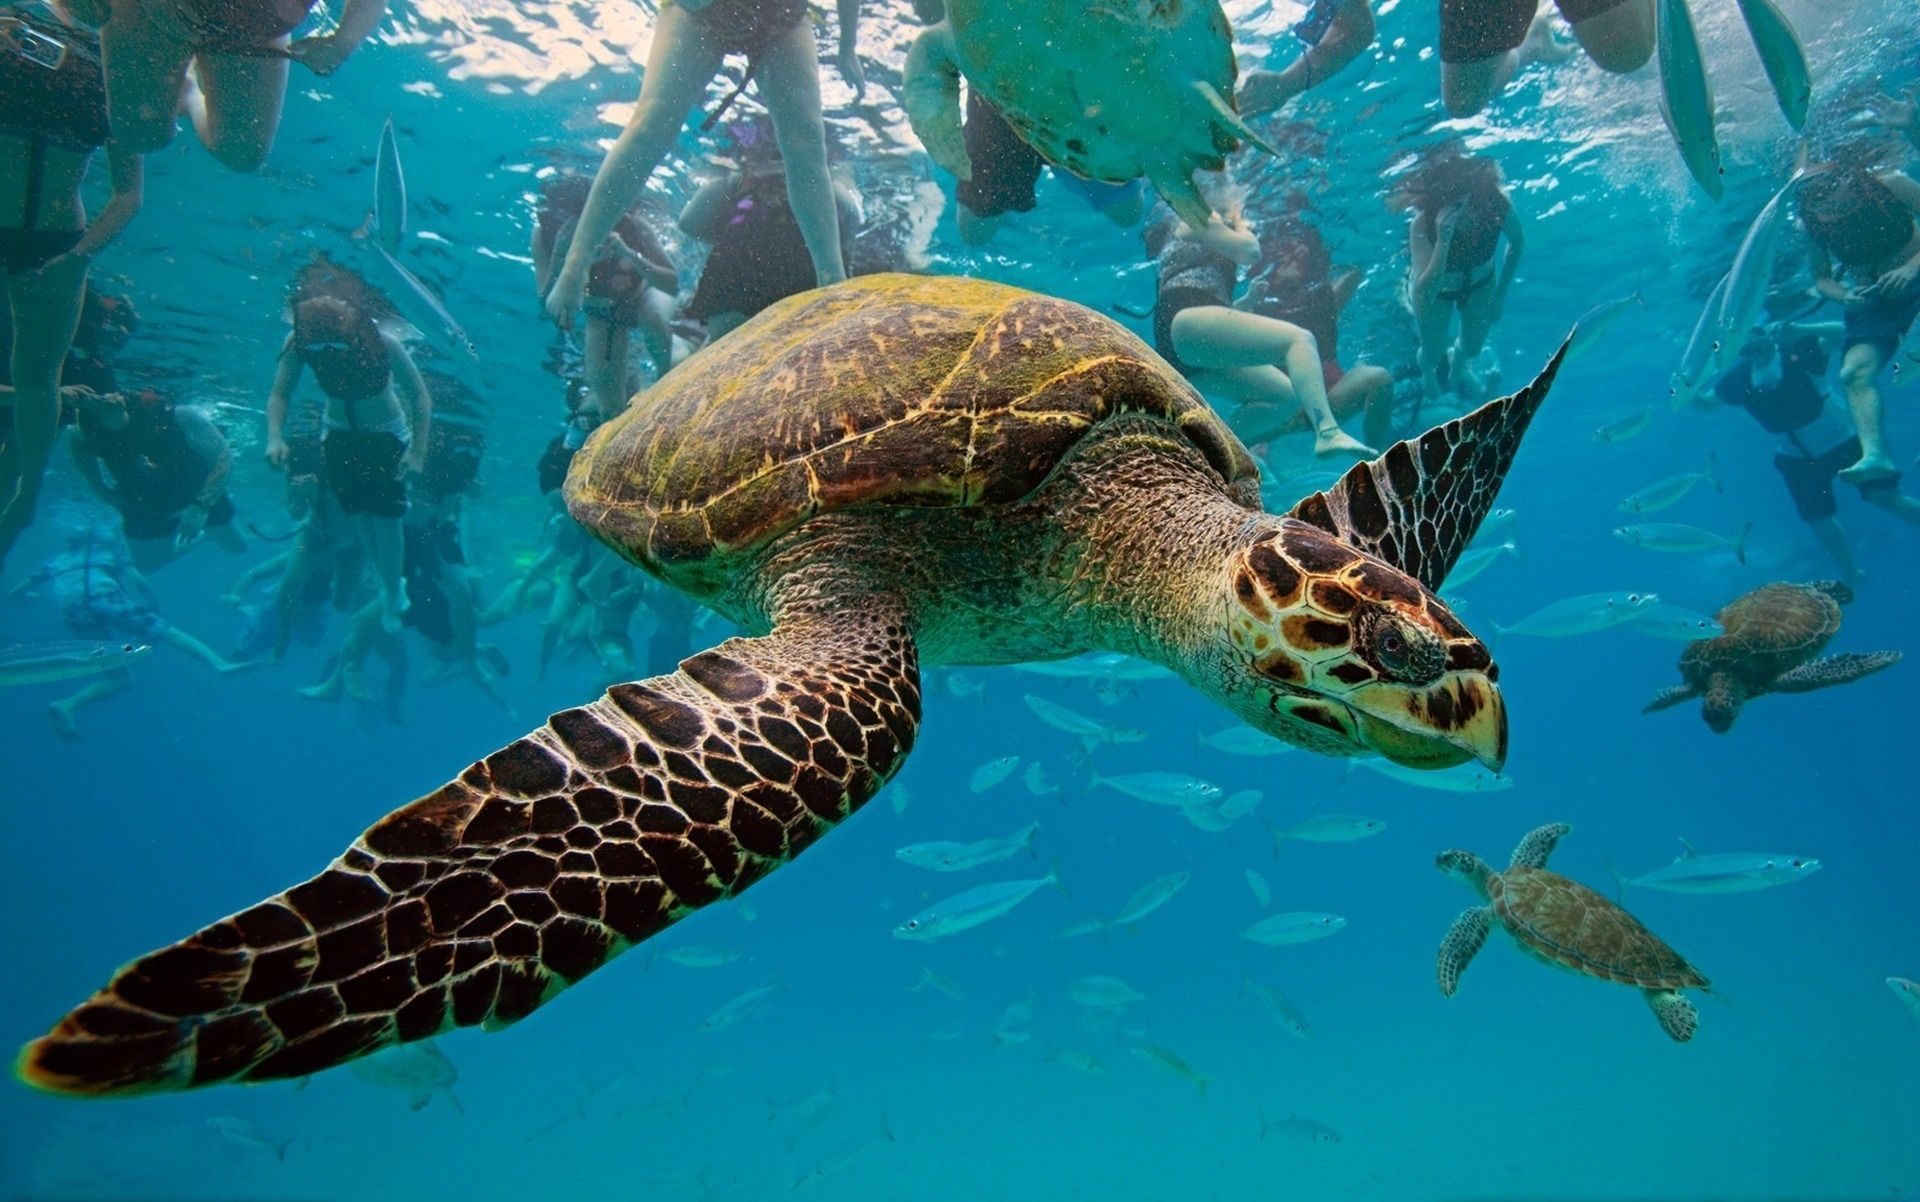 Caribbean Sea Creatures: Hawksbill-sea-turtle-turtle-underwater-ocean-caribbean-sea